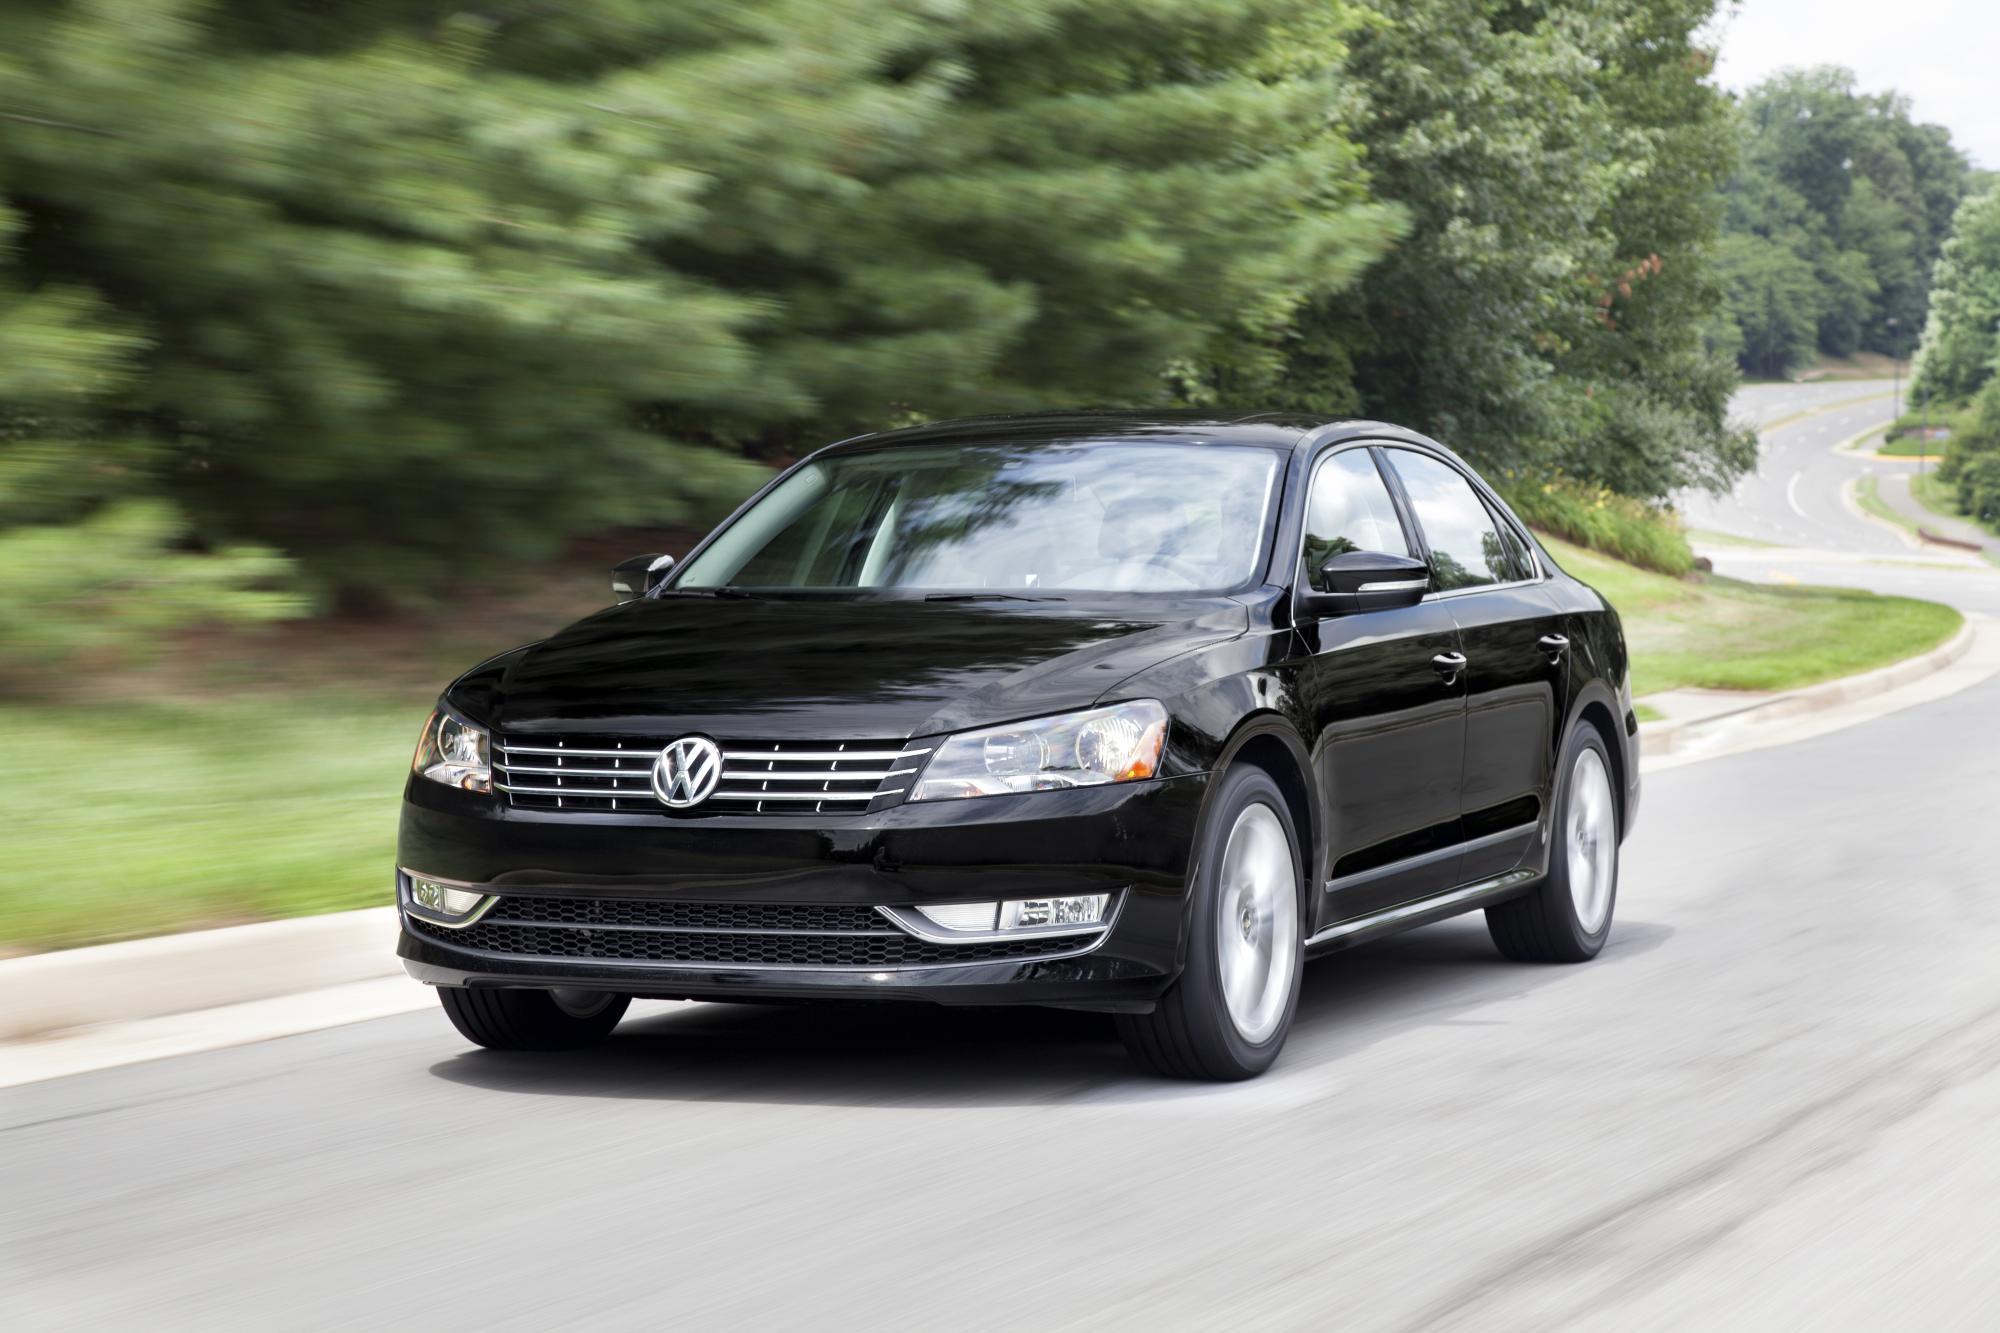 Volkswagen Group reports record sales in 2017 despite dieselgate hangover